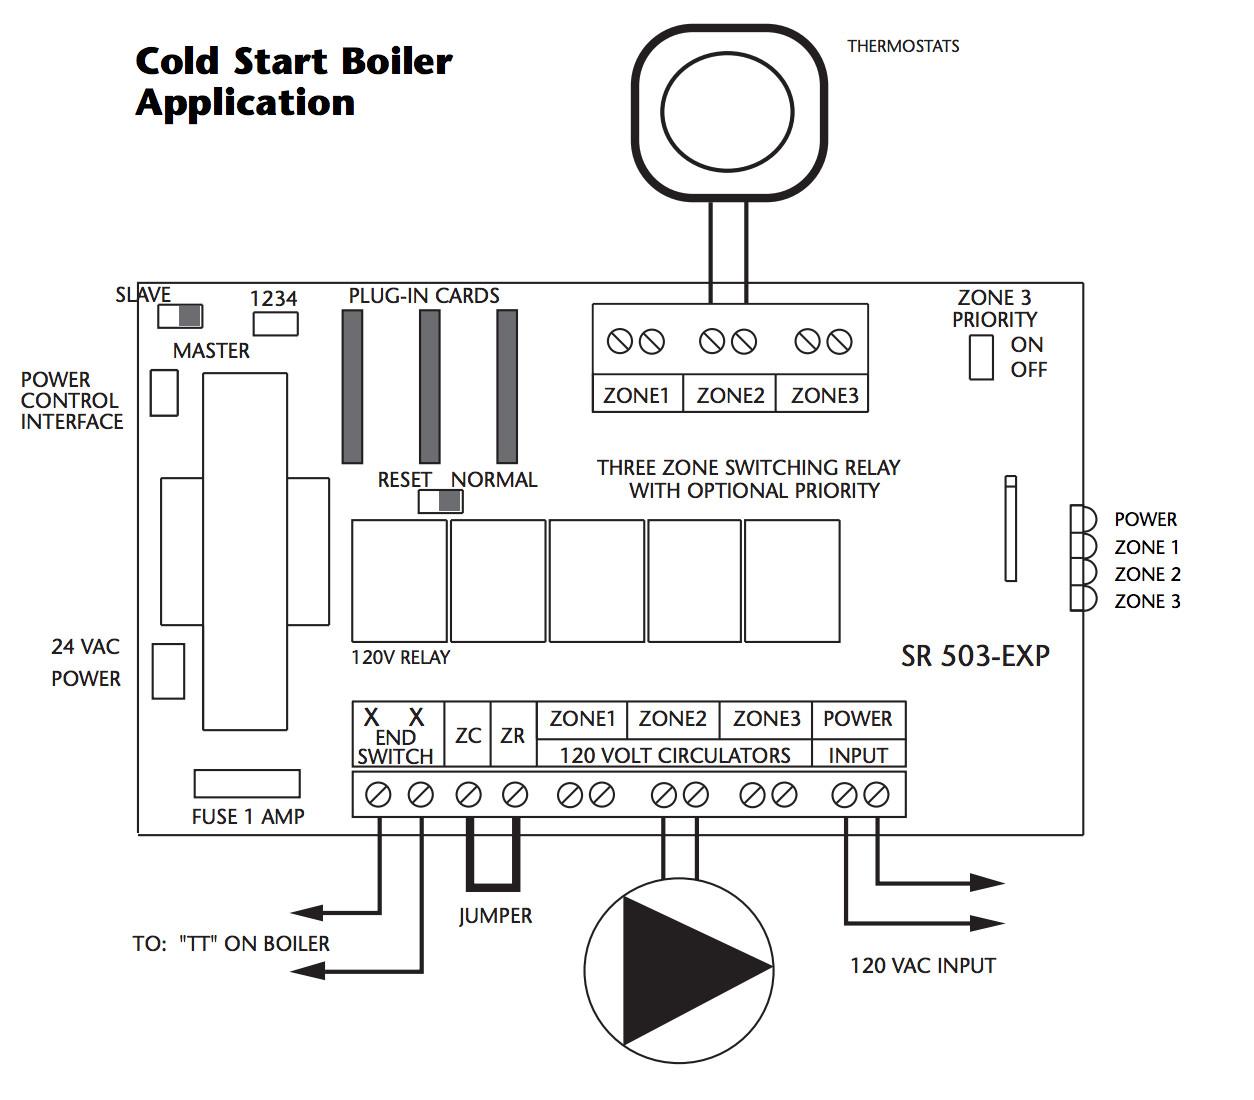 hight resolution of taco 00 circulator wiring simple wiring schema taco relay wiring circulator wiring diagram wiring diagrams taco